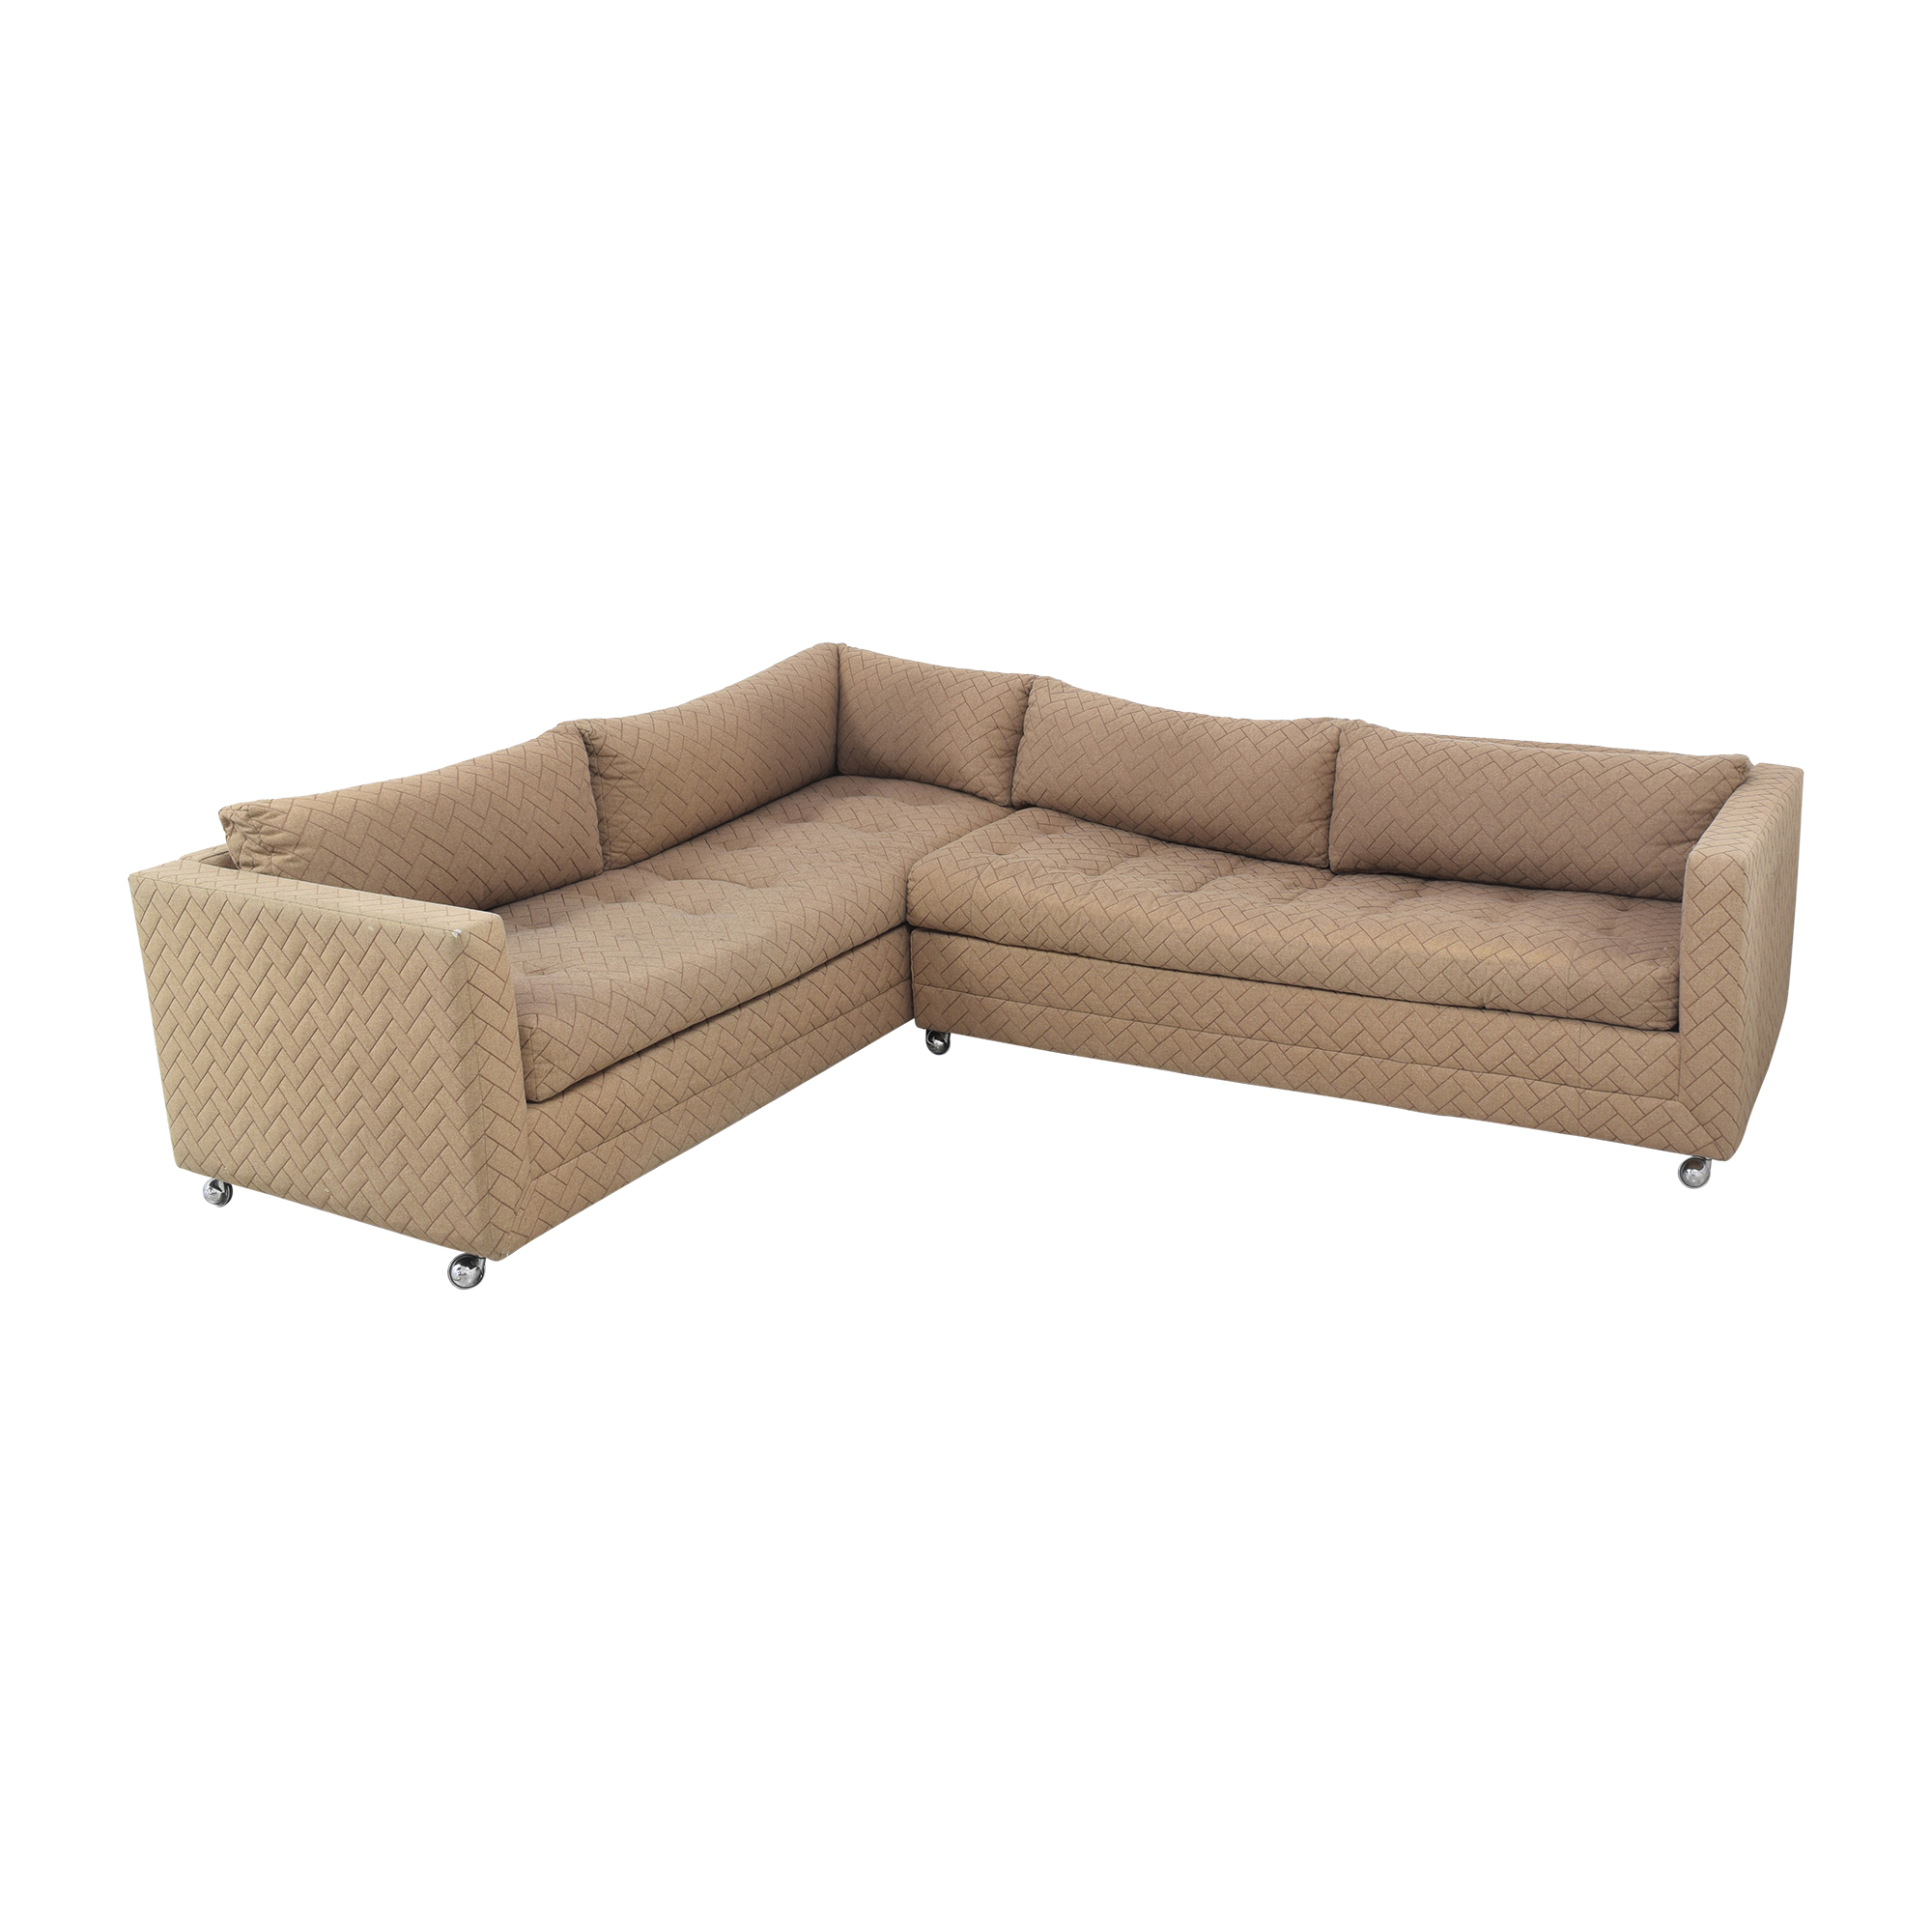 Avery Boardman Corner Sectional Sleeper Sofa / Sectionals